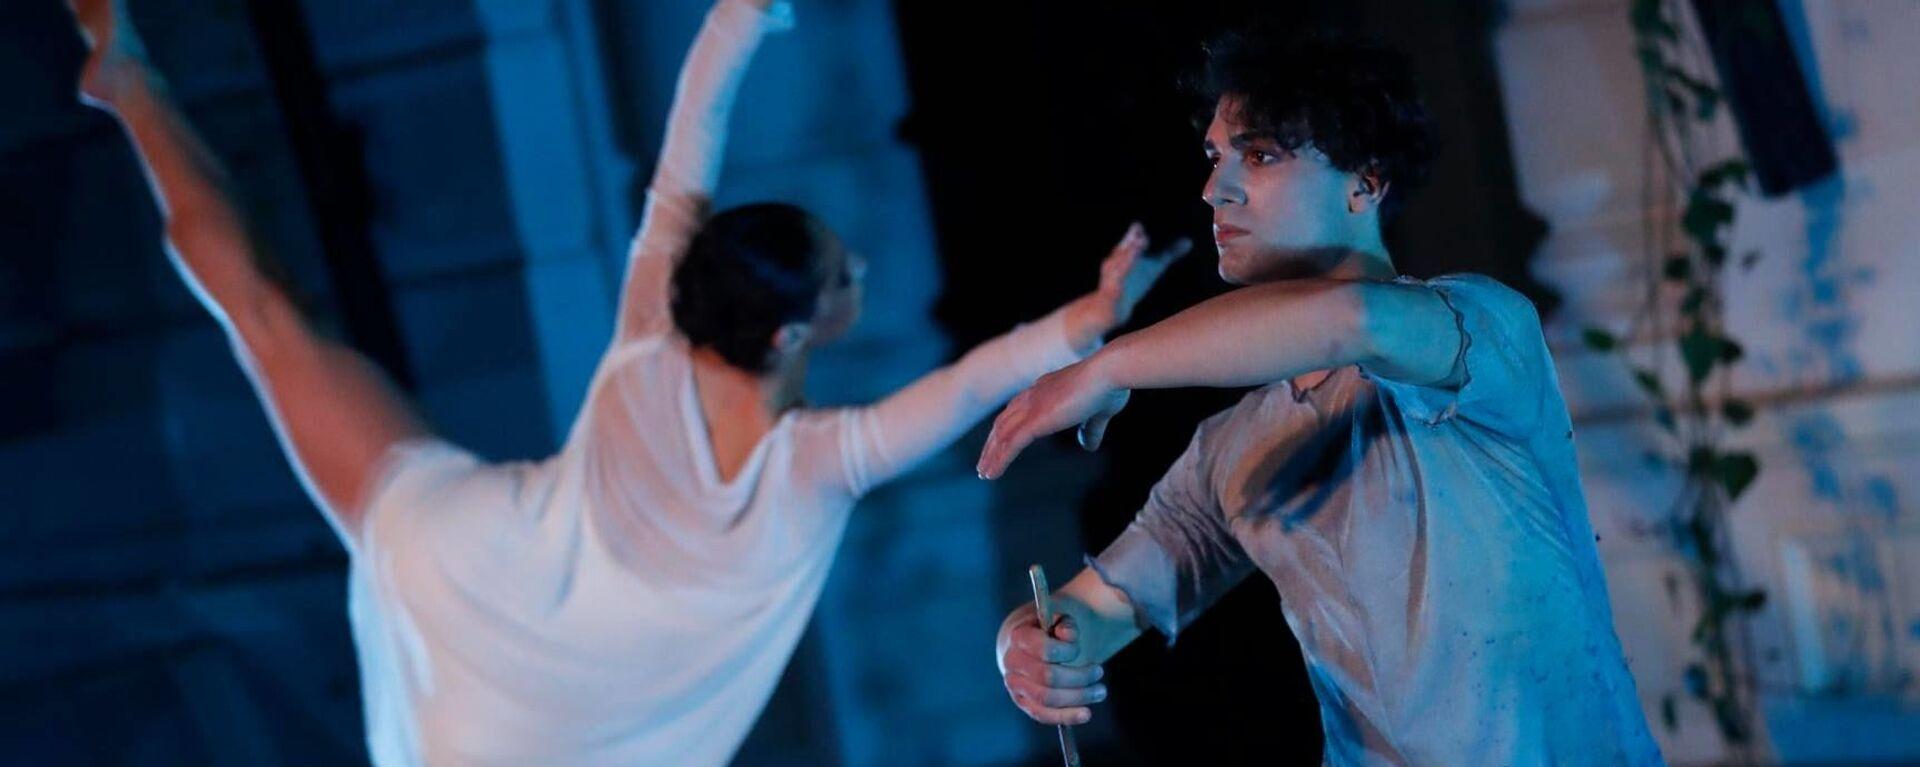 Giorgi Aleksidze - Tbilisi Contemporary Ballet - Sputnik საქართველო, 1920, 14.05.2021